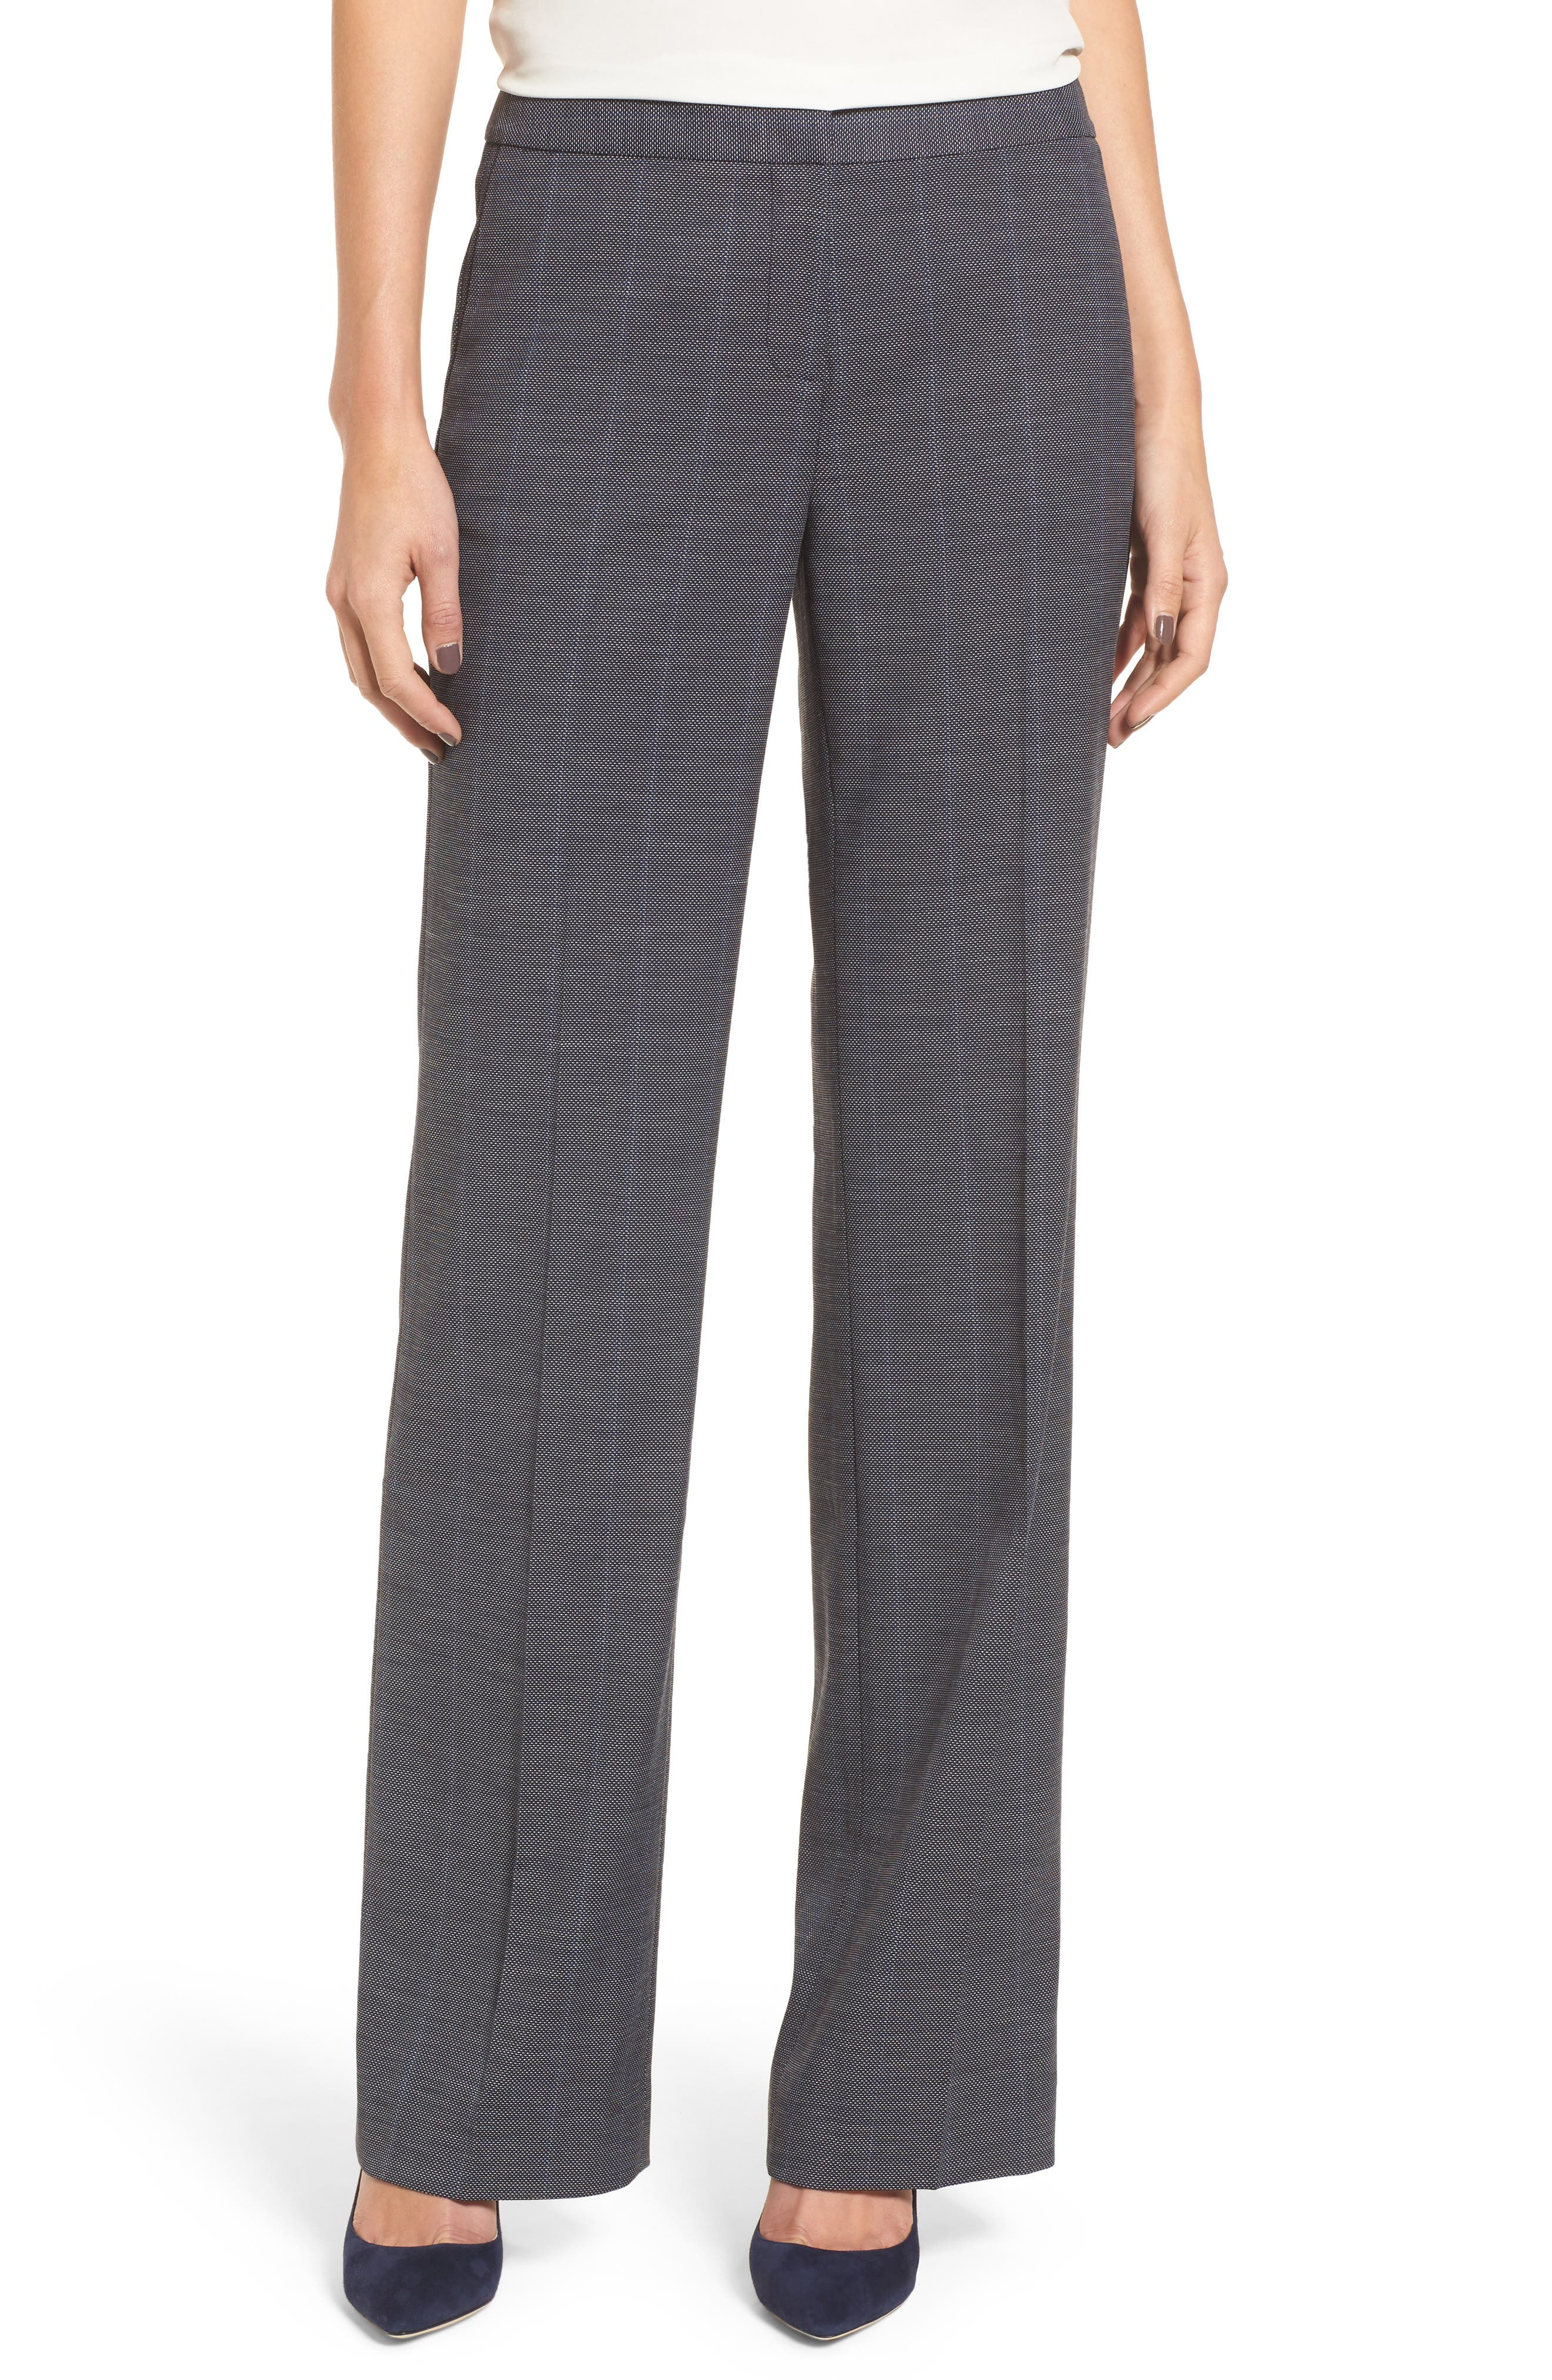 Cross Dye Suit Pants,                         Main,                         color, Navy Crossdye Pattern